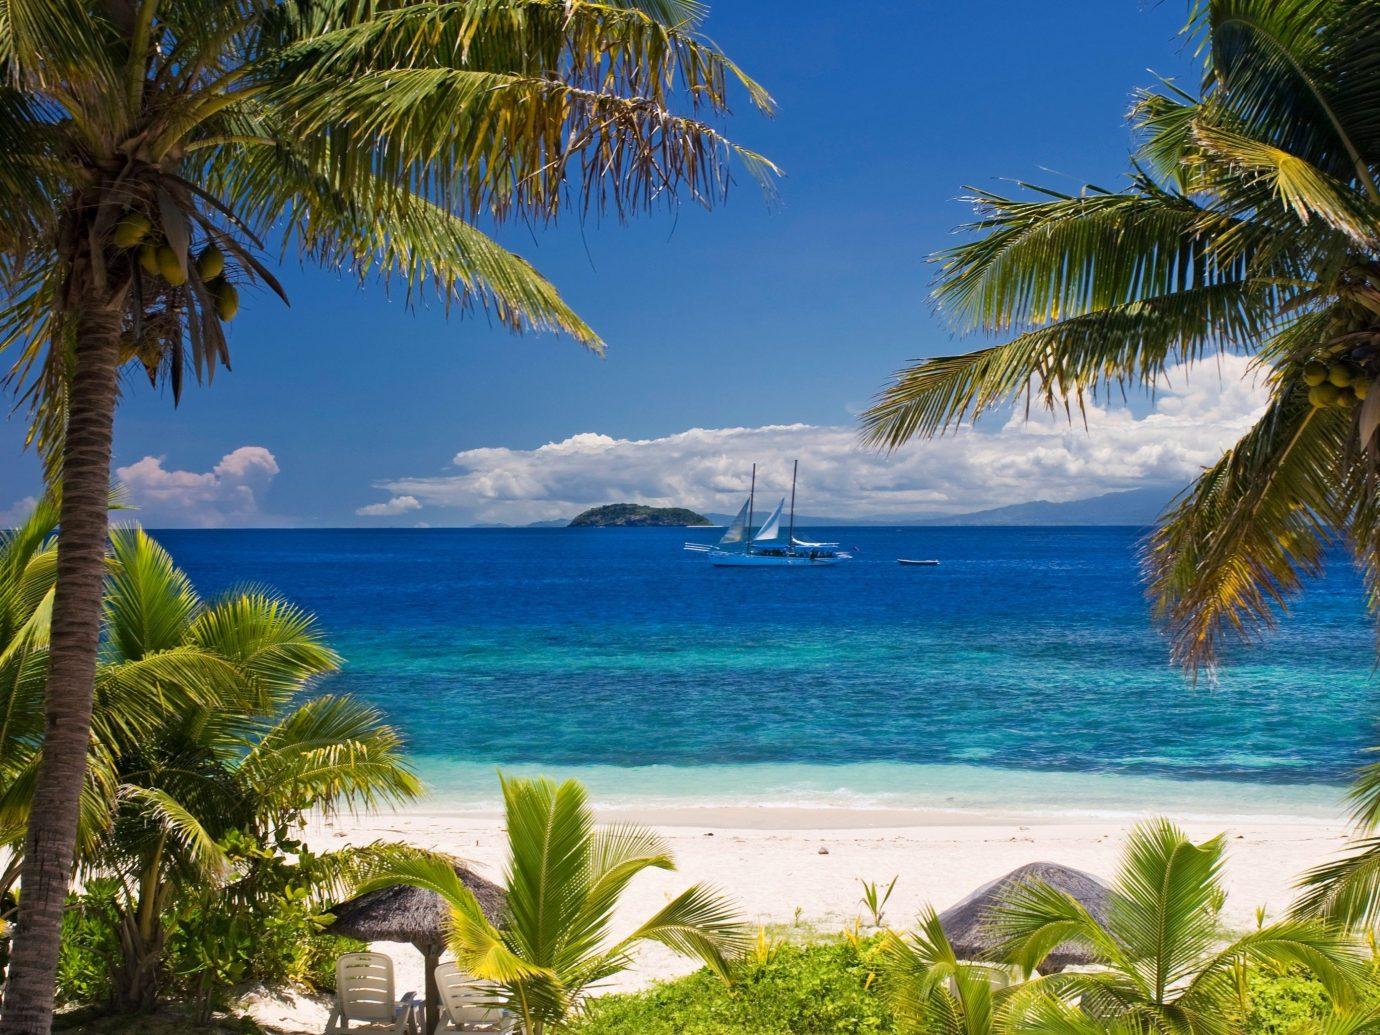 tree palm outdoor water Beach caribbean Ocean vacation body of water Sea tropics Coast Pool Resort palm family arecales bay Lagoon plant estate Island shade lined cape sandy shore